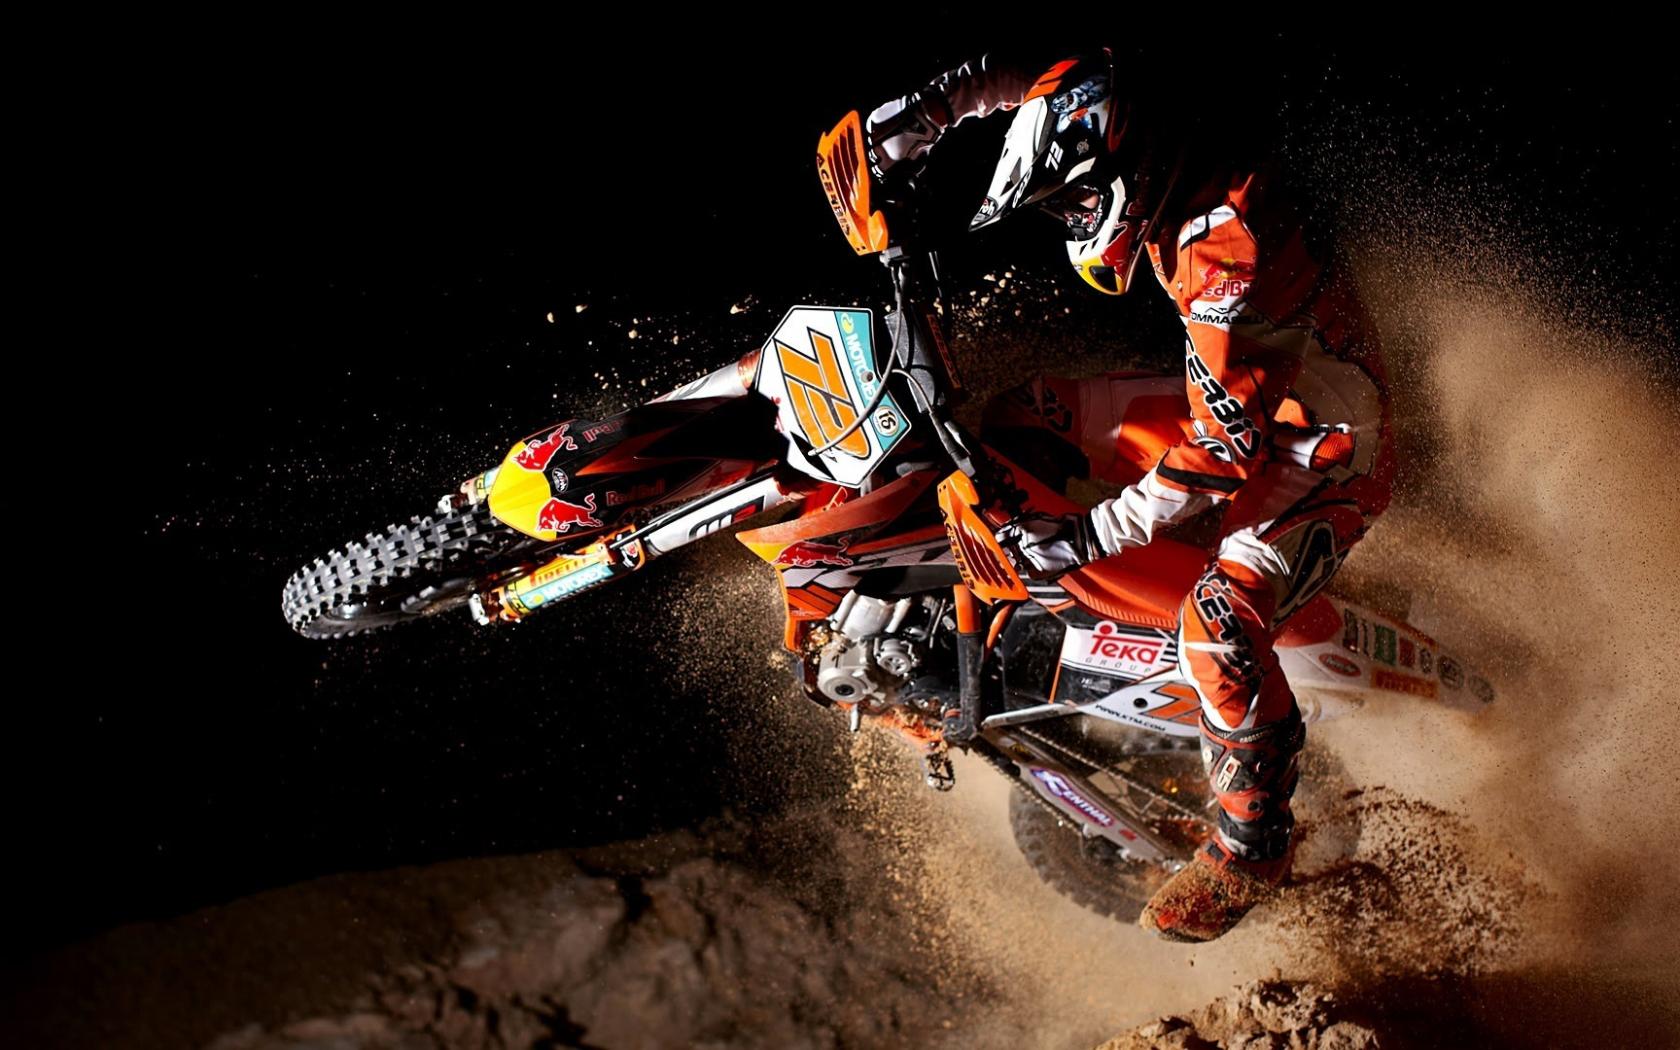 motocross motorcycles dirt track racing race ktm bike wallpaper 1680x1050